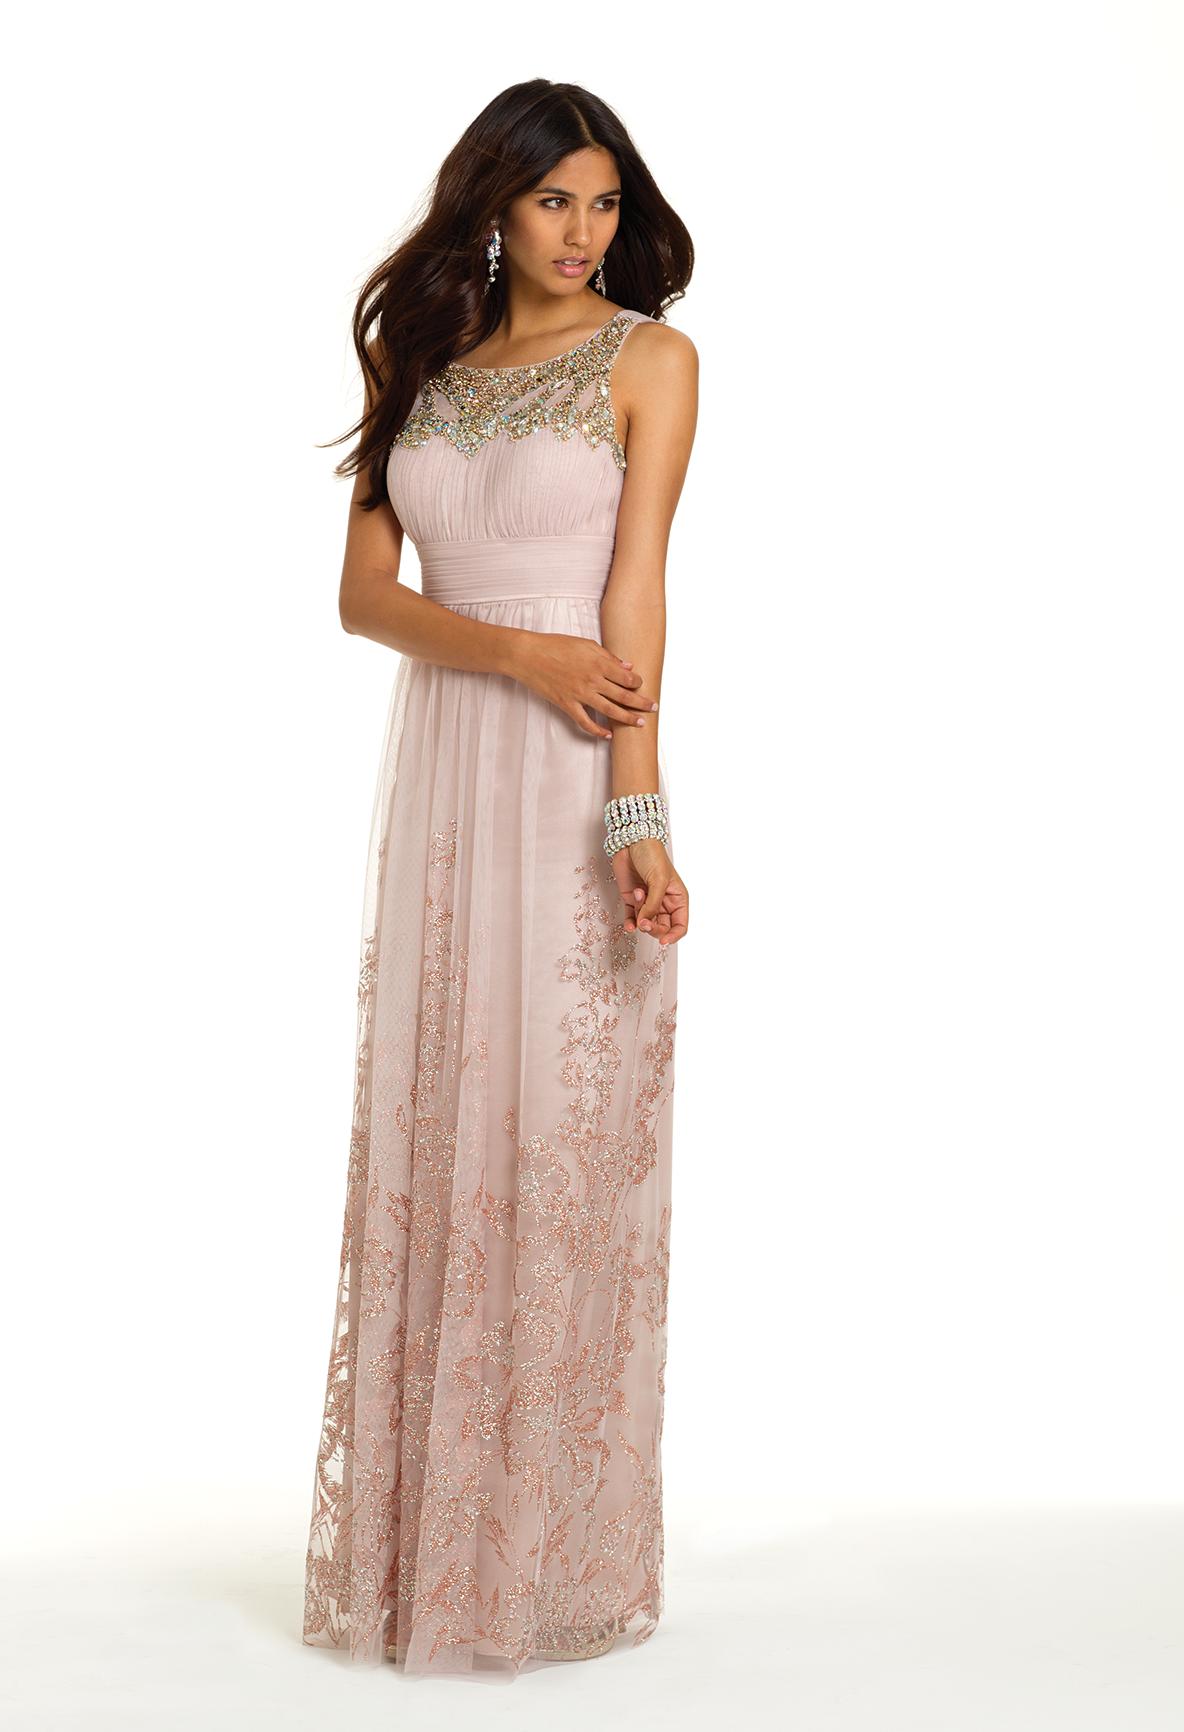 Camille La Vie Prom Dresses